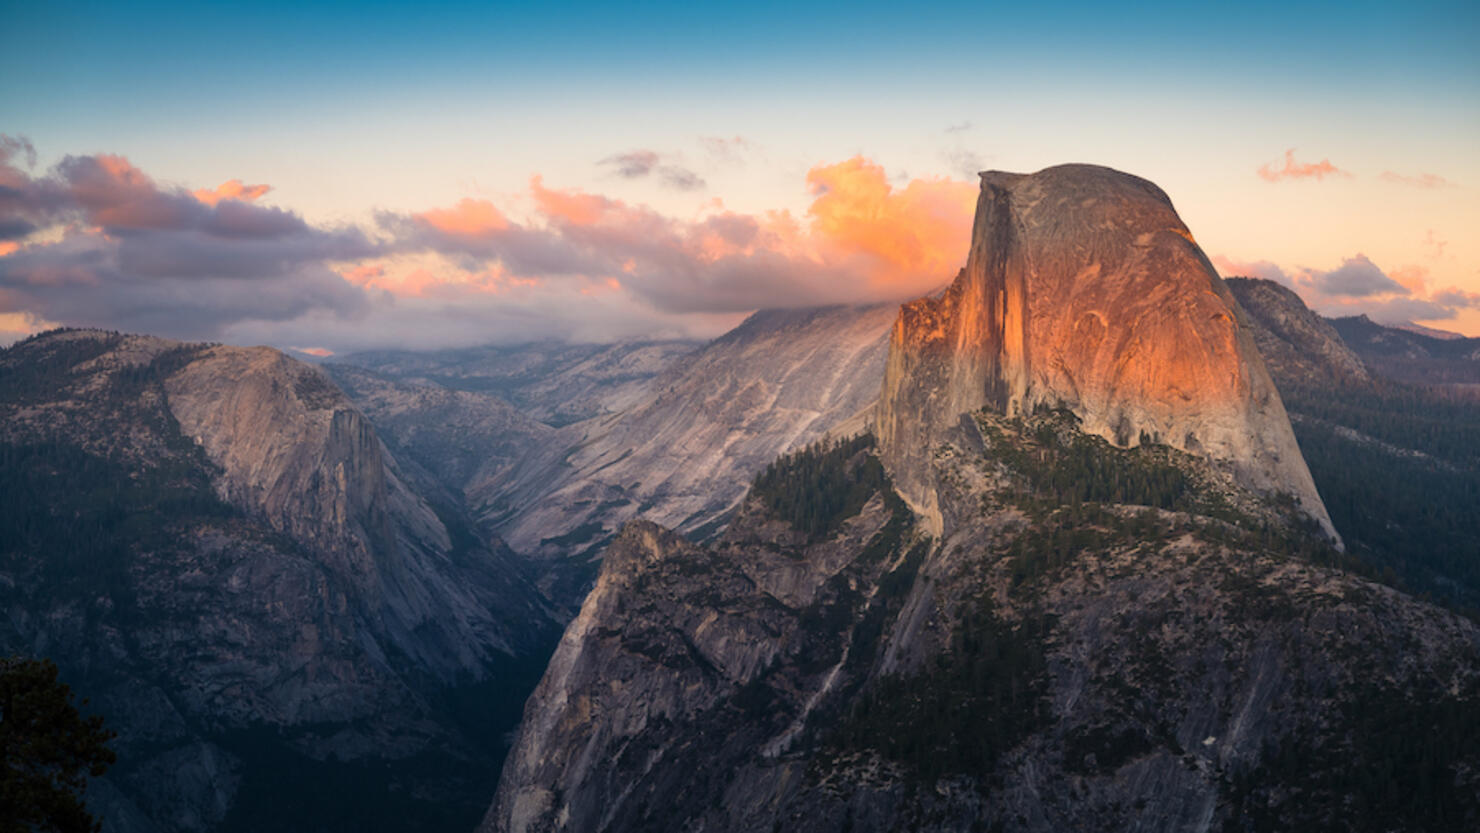 Yosemite National Park, California. USA